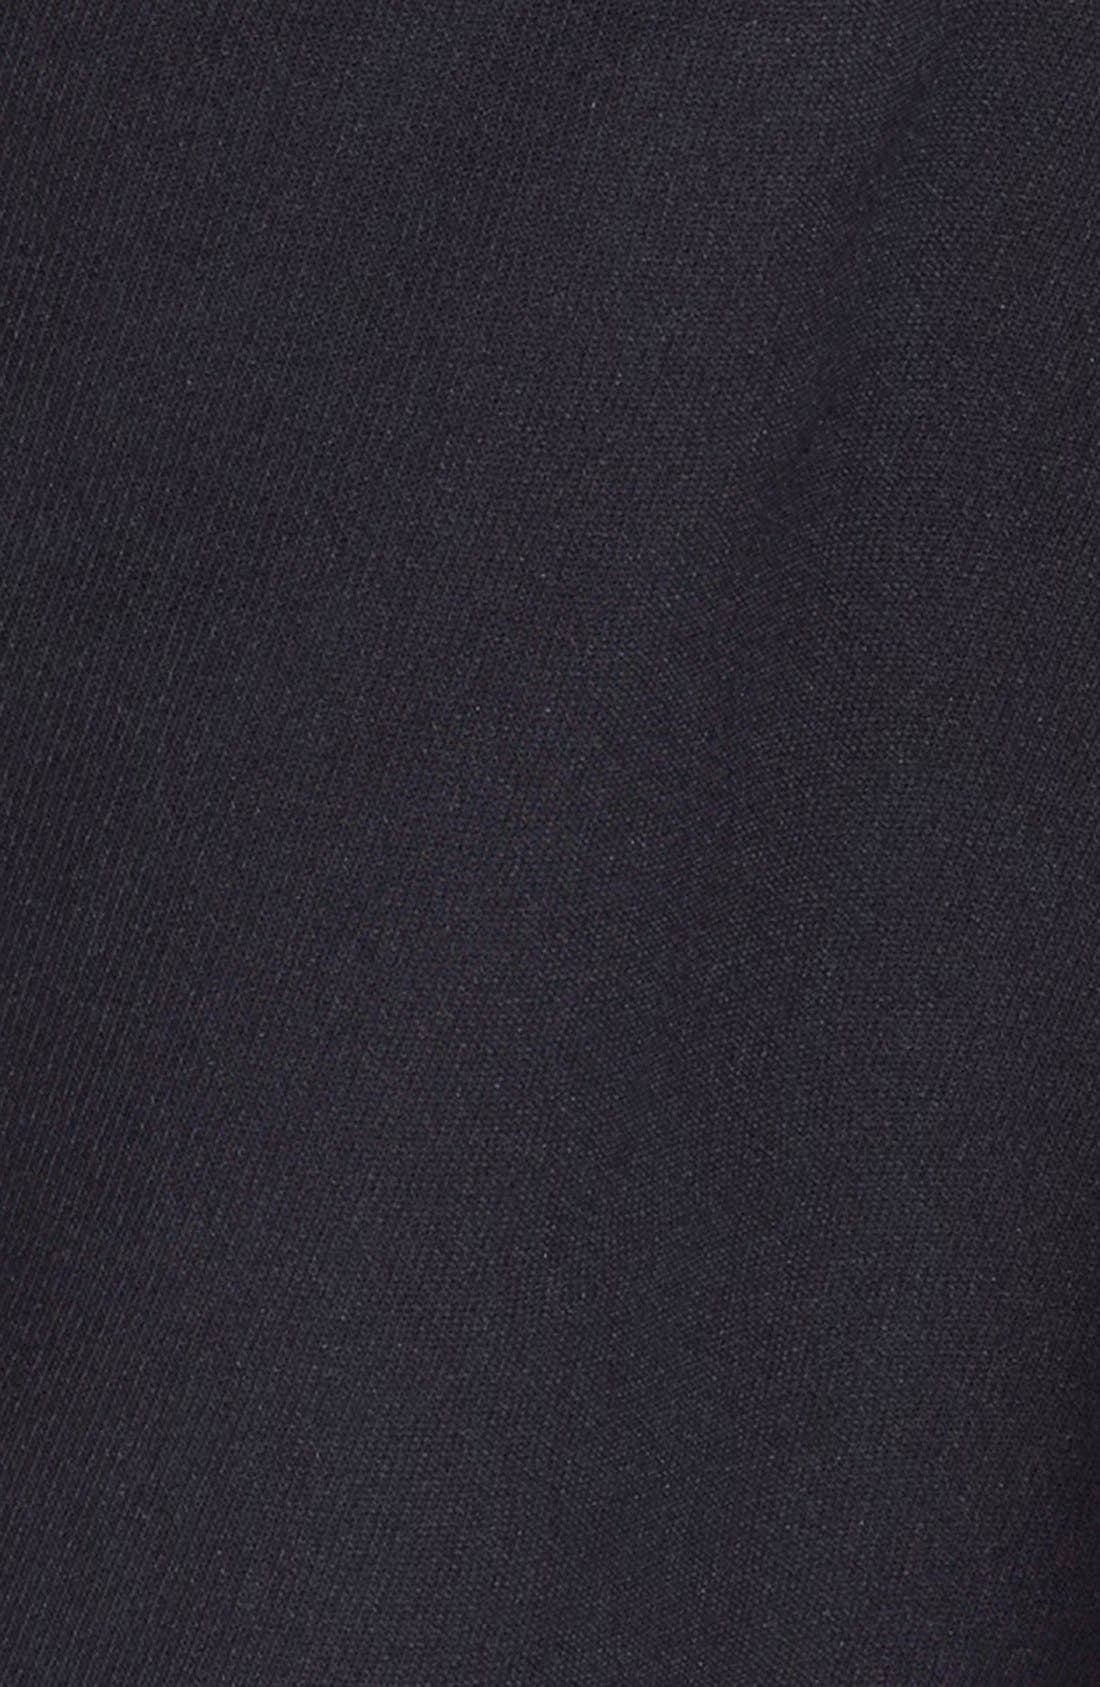 Alternate Image 3  - Comme des Garçons Buckle Detail Draped Serge Skirt